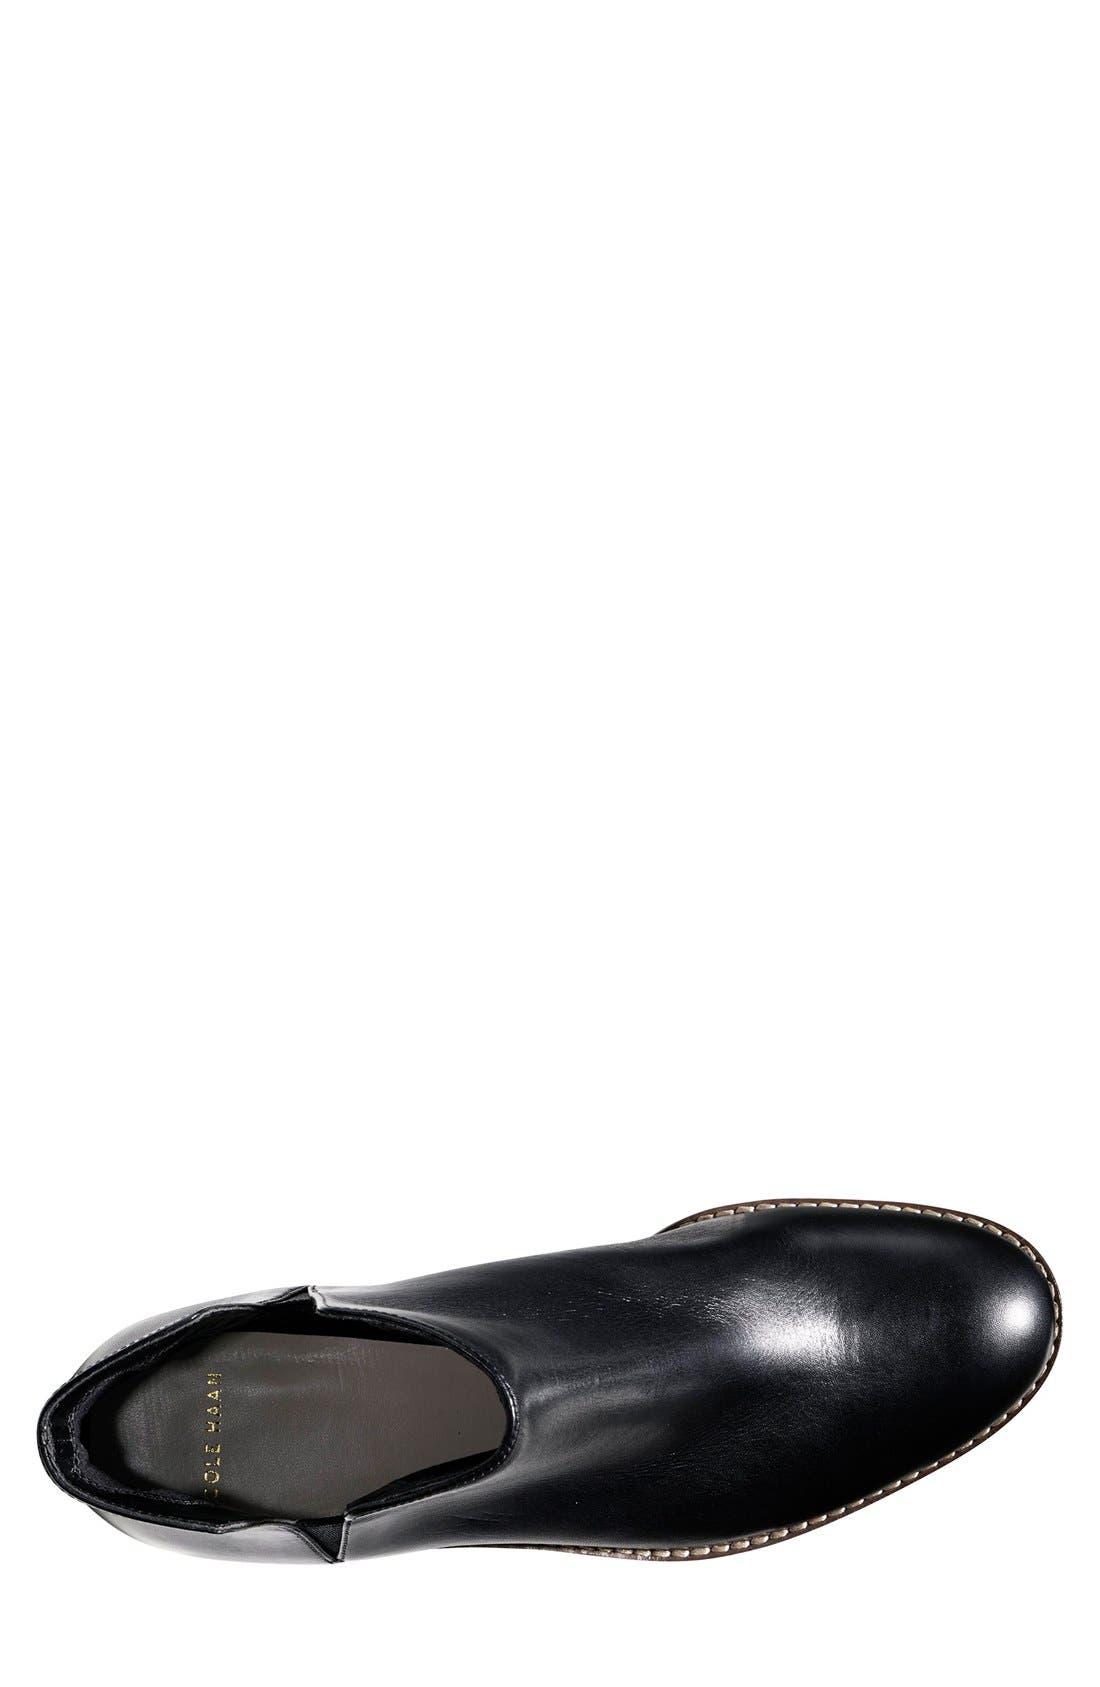 Alternate Image 2  - Cole Haan 'Abbot' Chelsea Boot (Women)